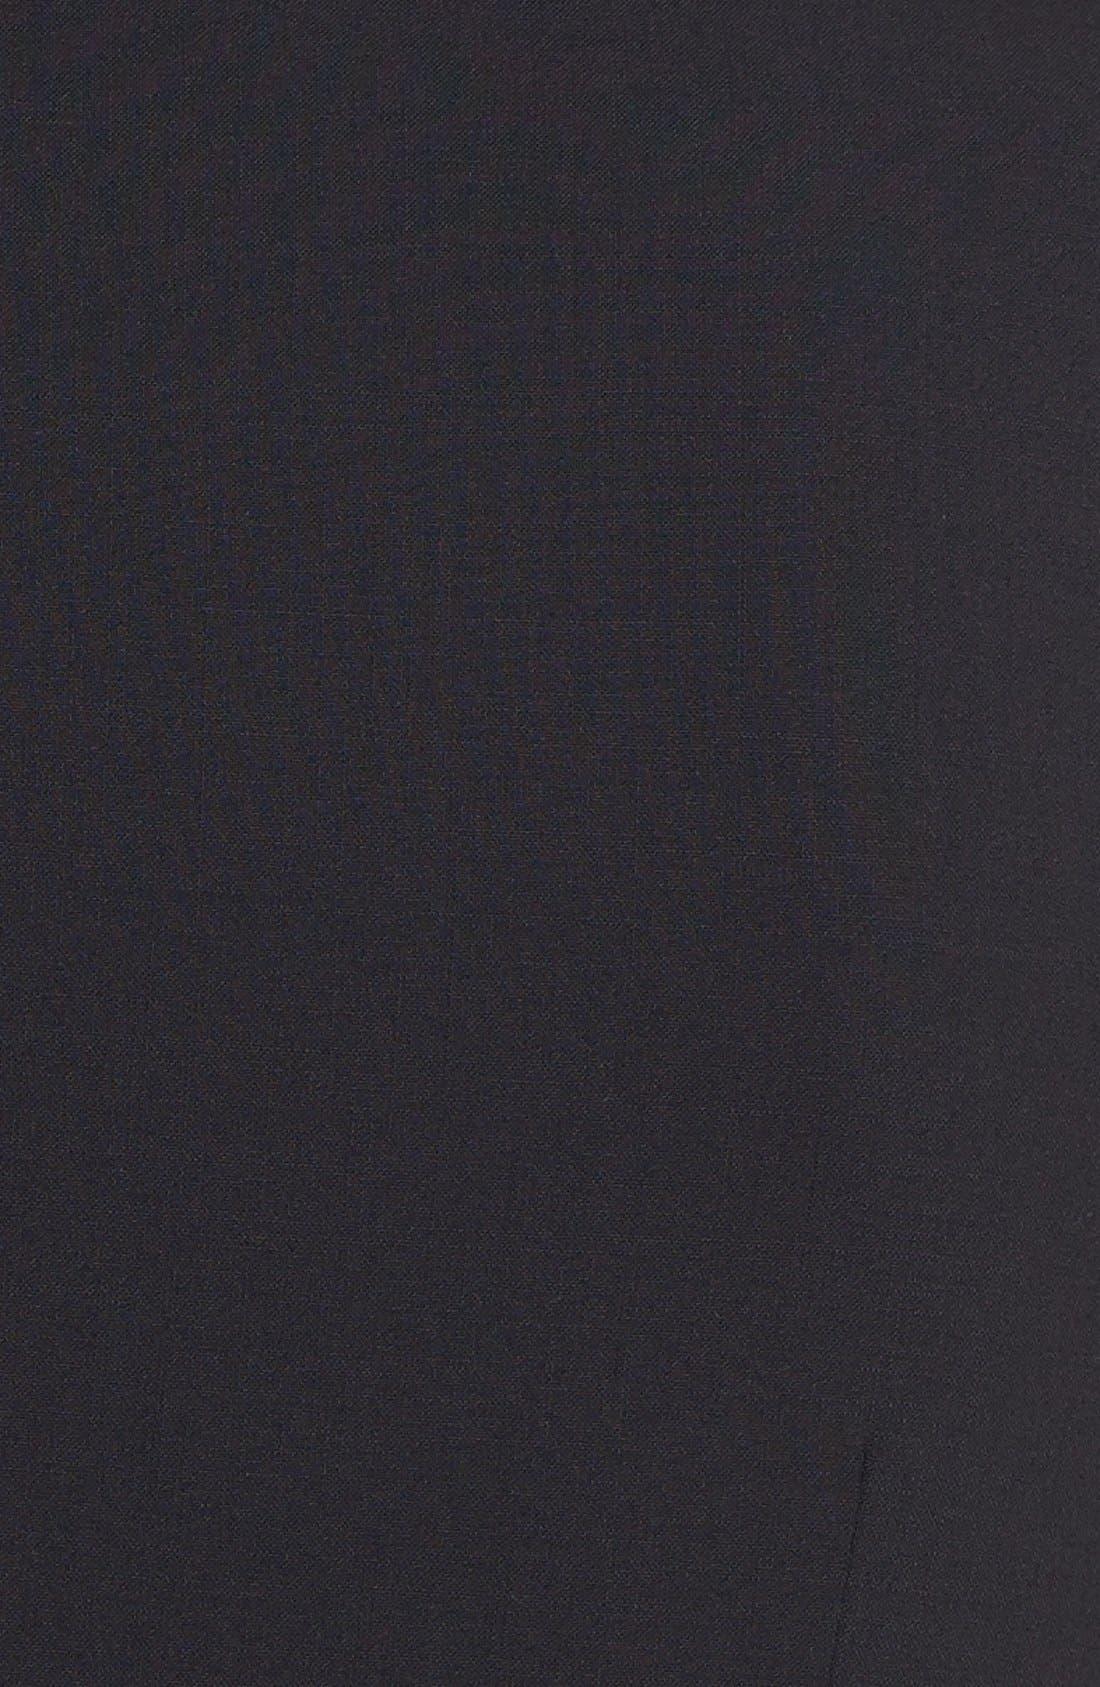 Alternate Image 3  - BOSS 'Dinoma' Stretch Wool Sheath Dress